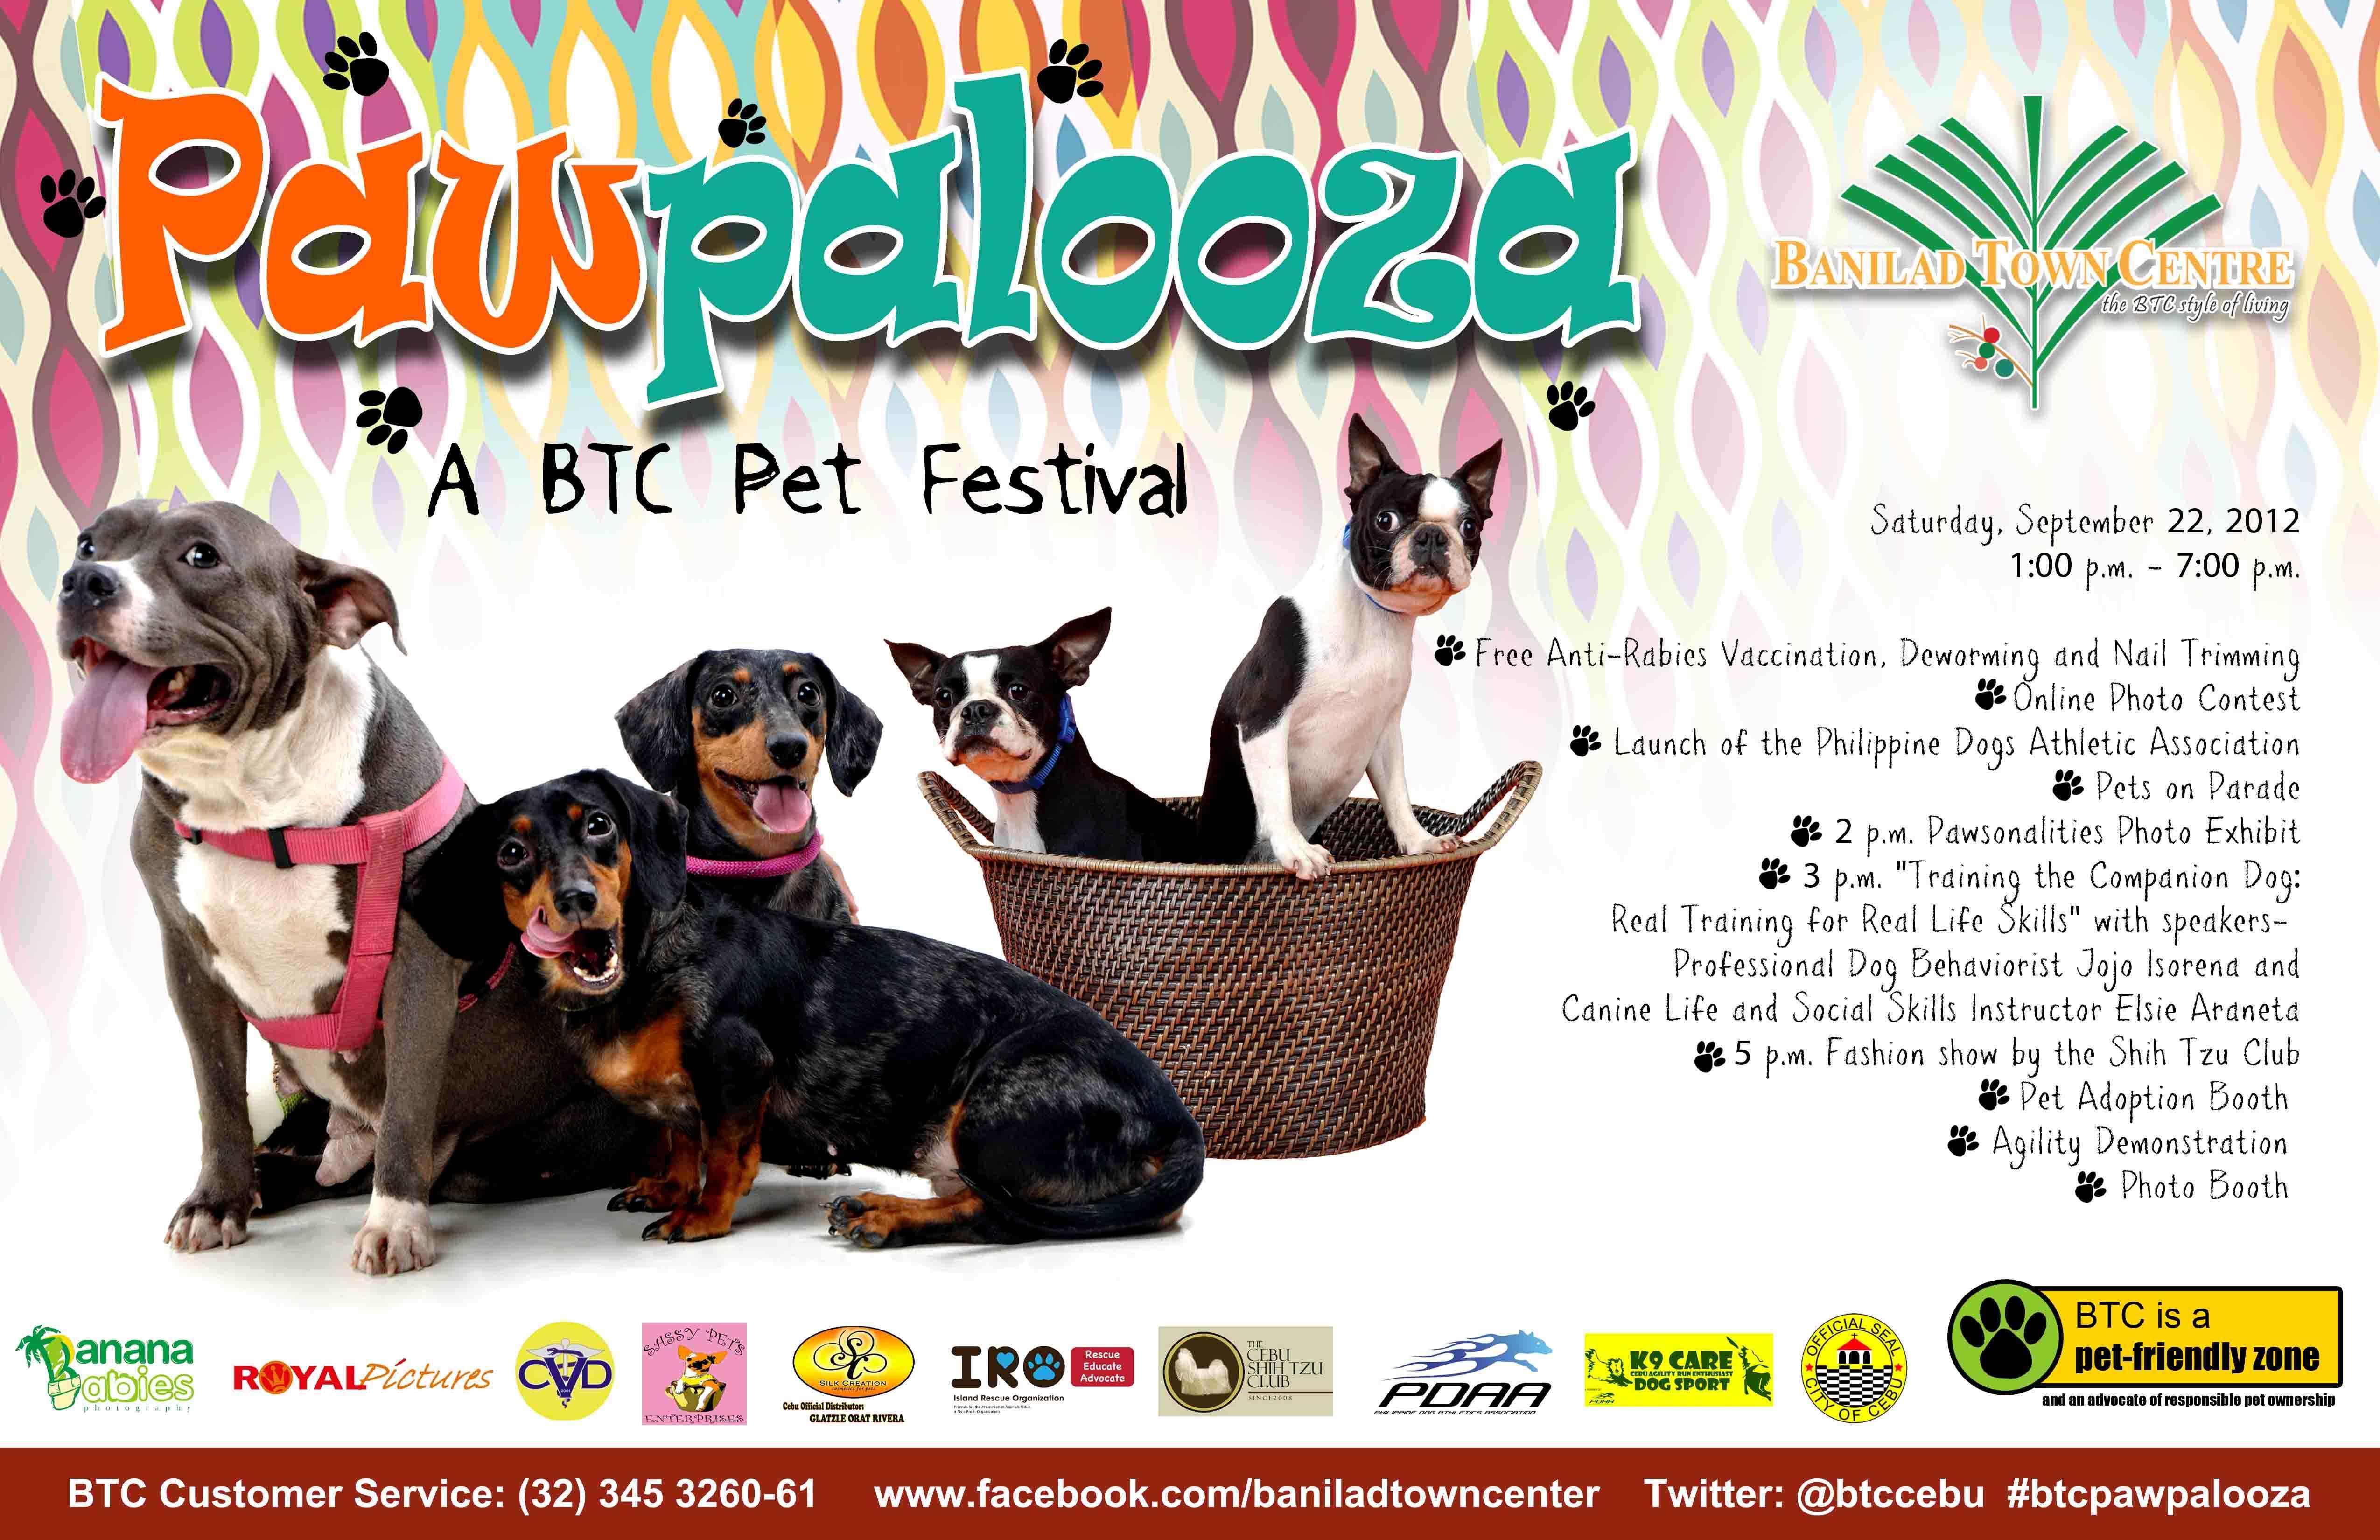 BTC Pawpalooza Pet Festival